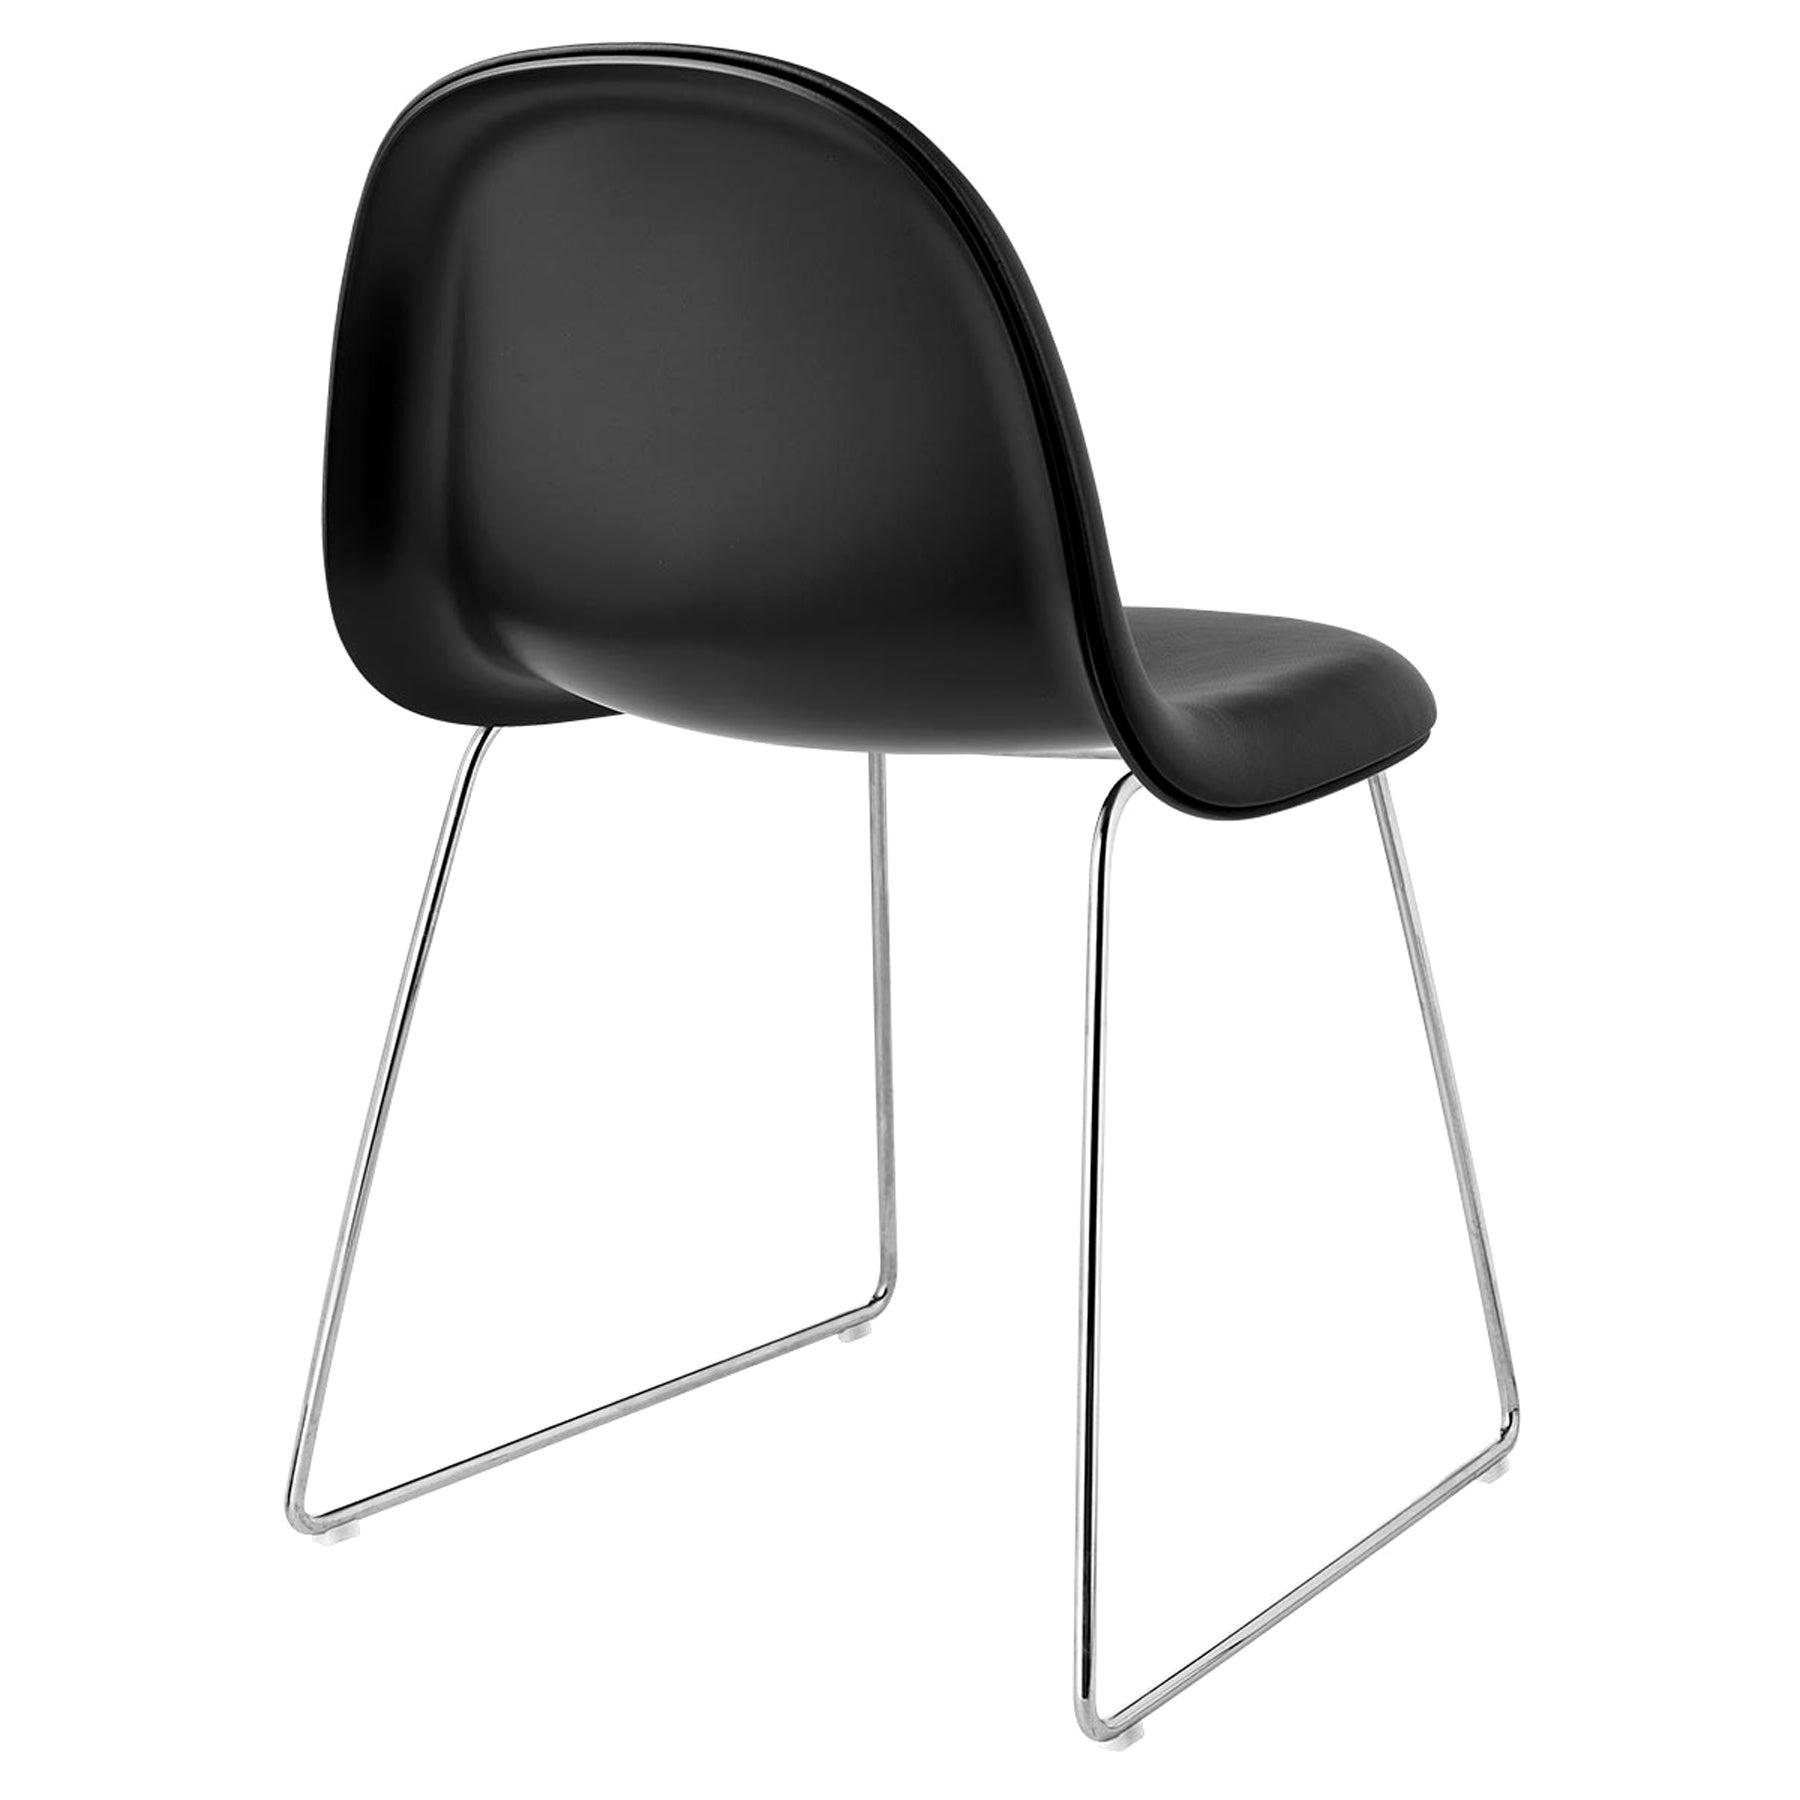 3D Dining Chair, Front Upholstered, Sledge base, Chrome